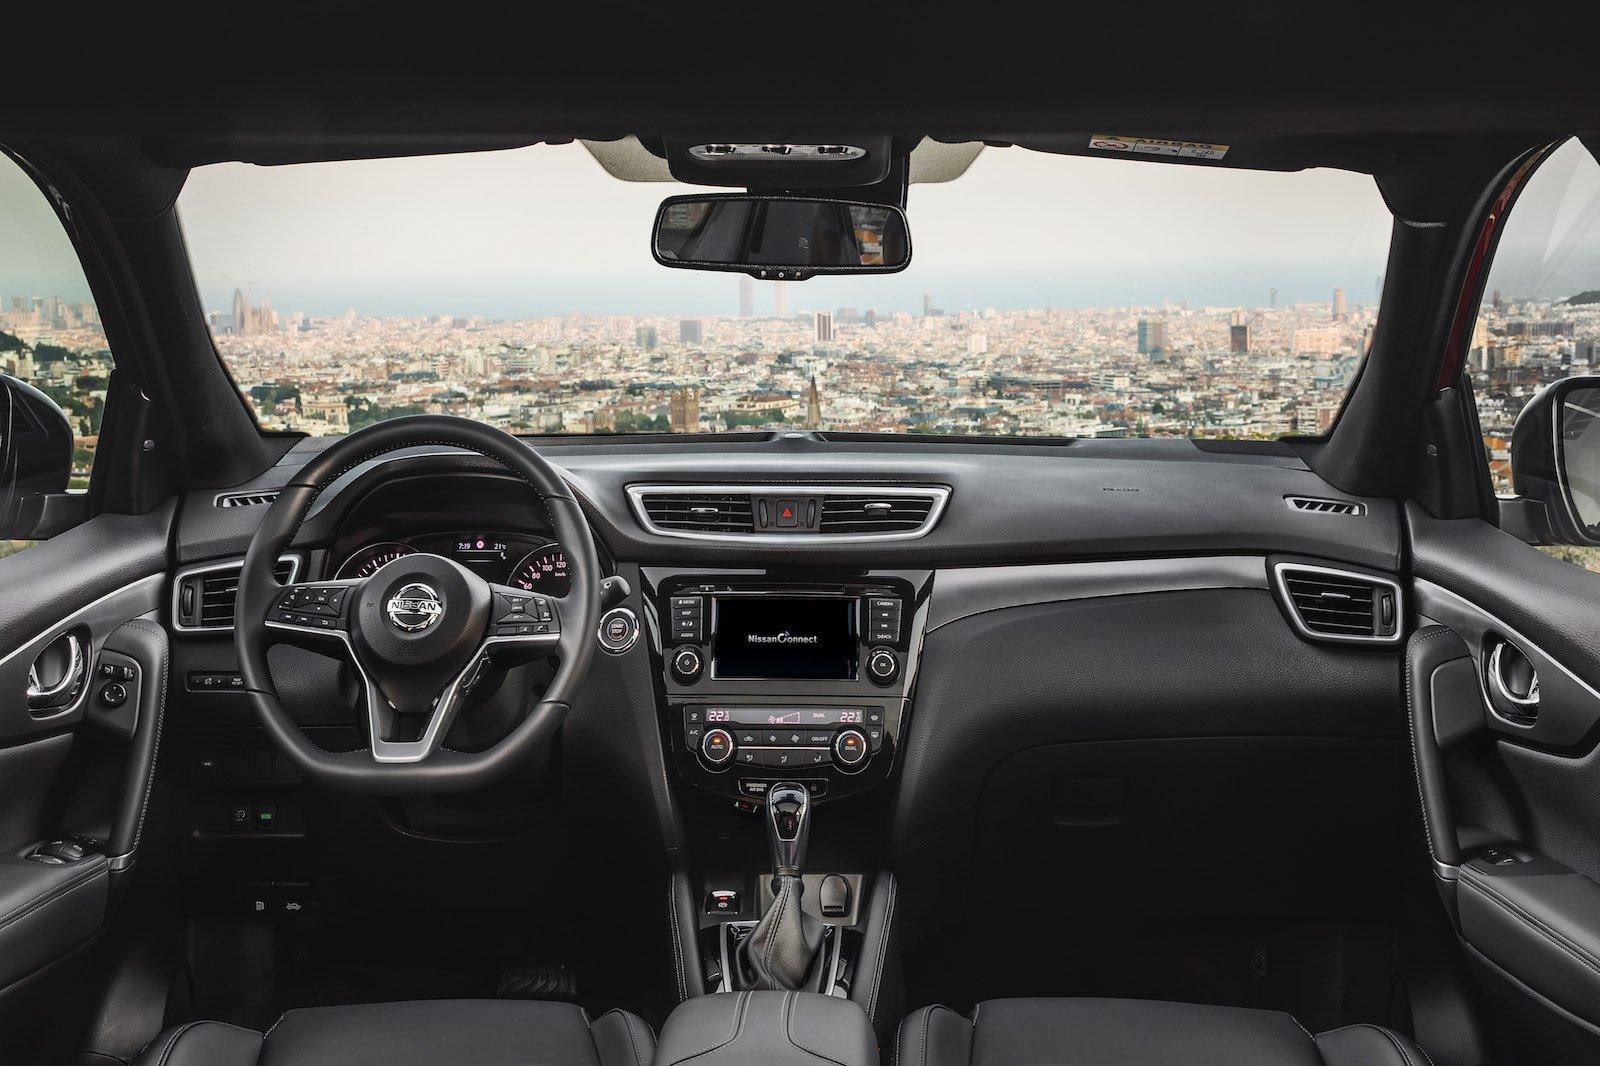 2018 Nissan Qashqai 1.3 DiG-T dashboard